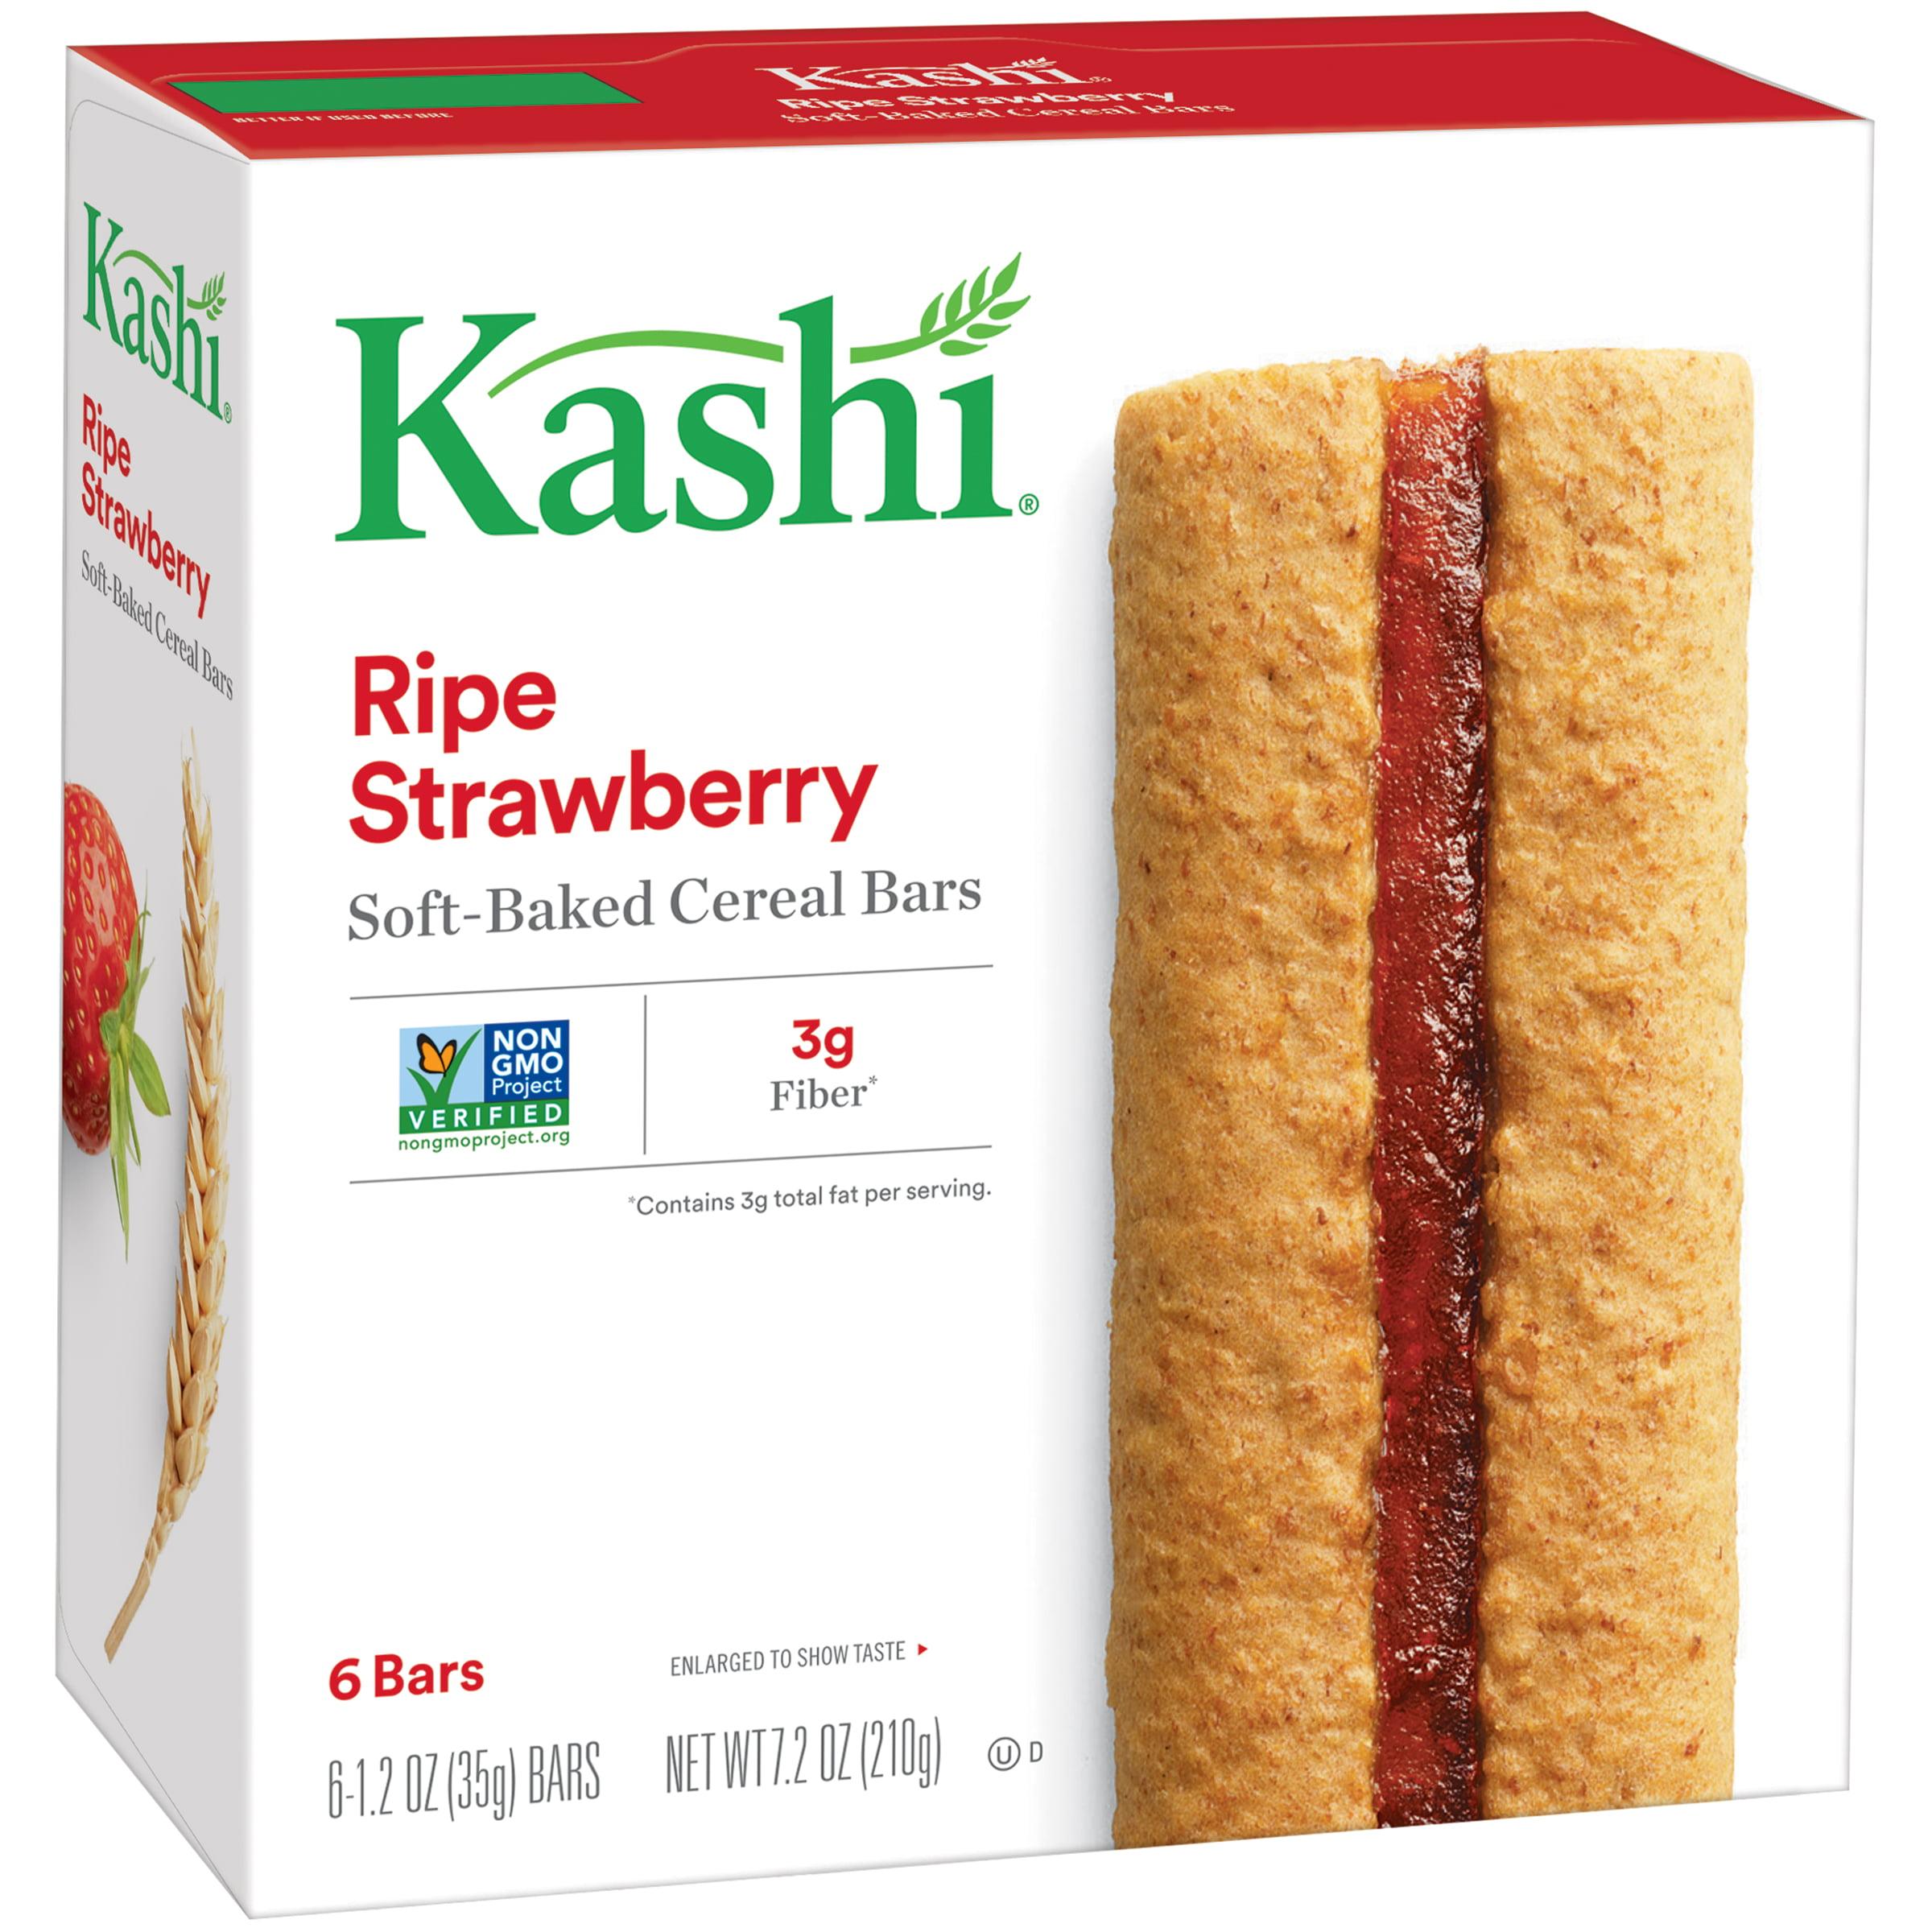 Kashi�� Ripe Strawberry Soft-Baked Cereal Bars 6-1.2 oz. Bars